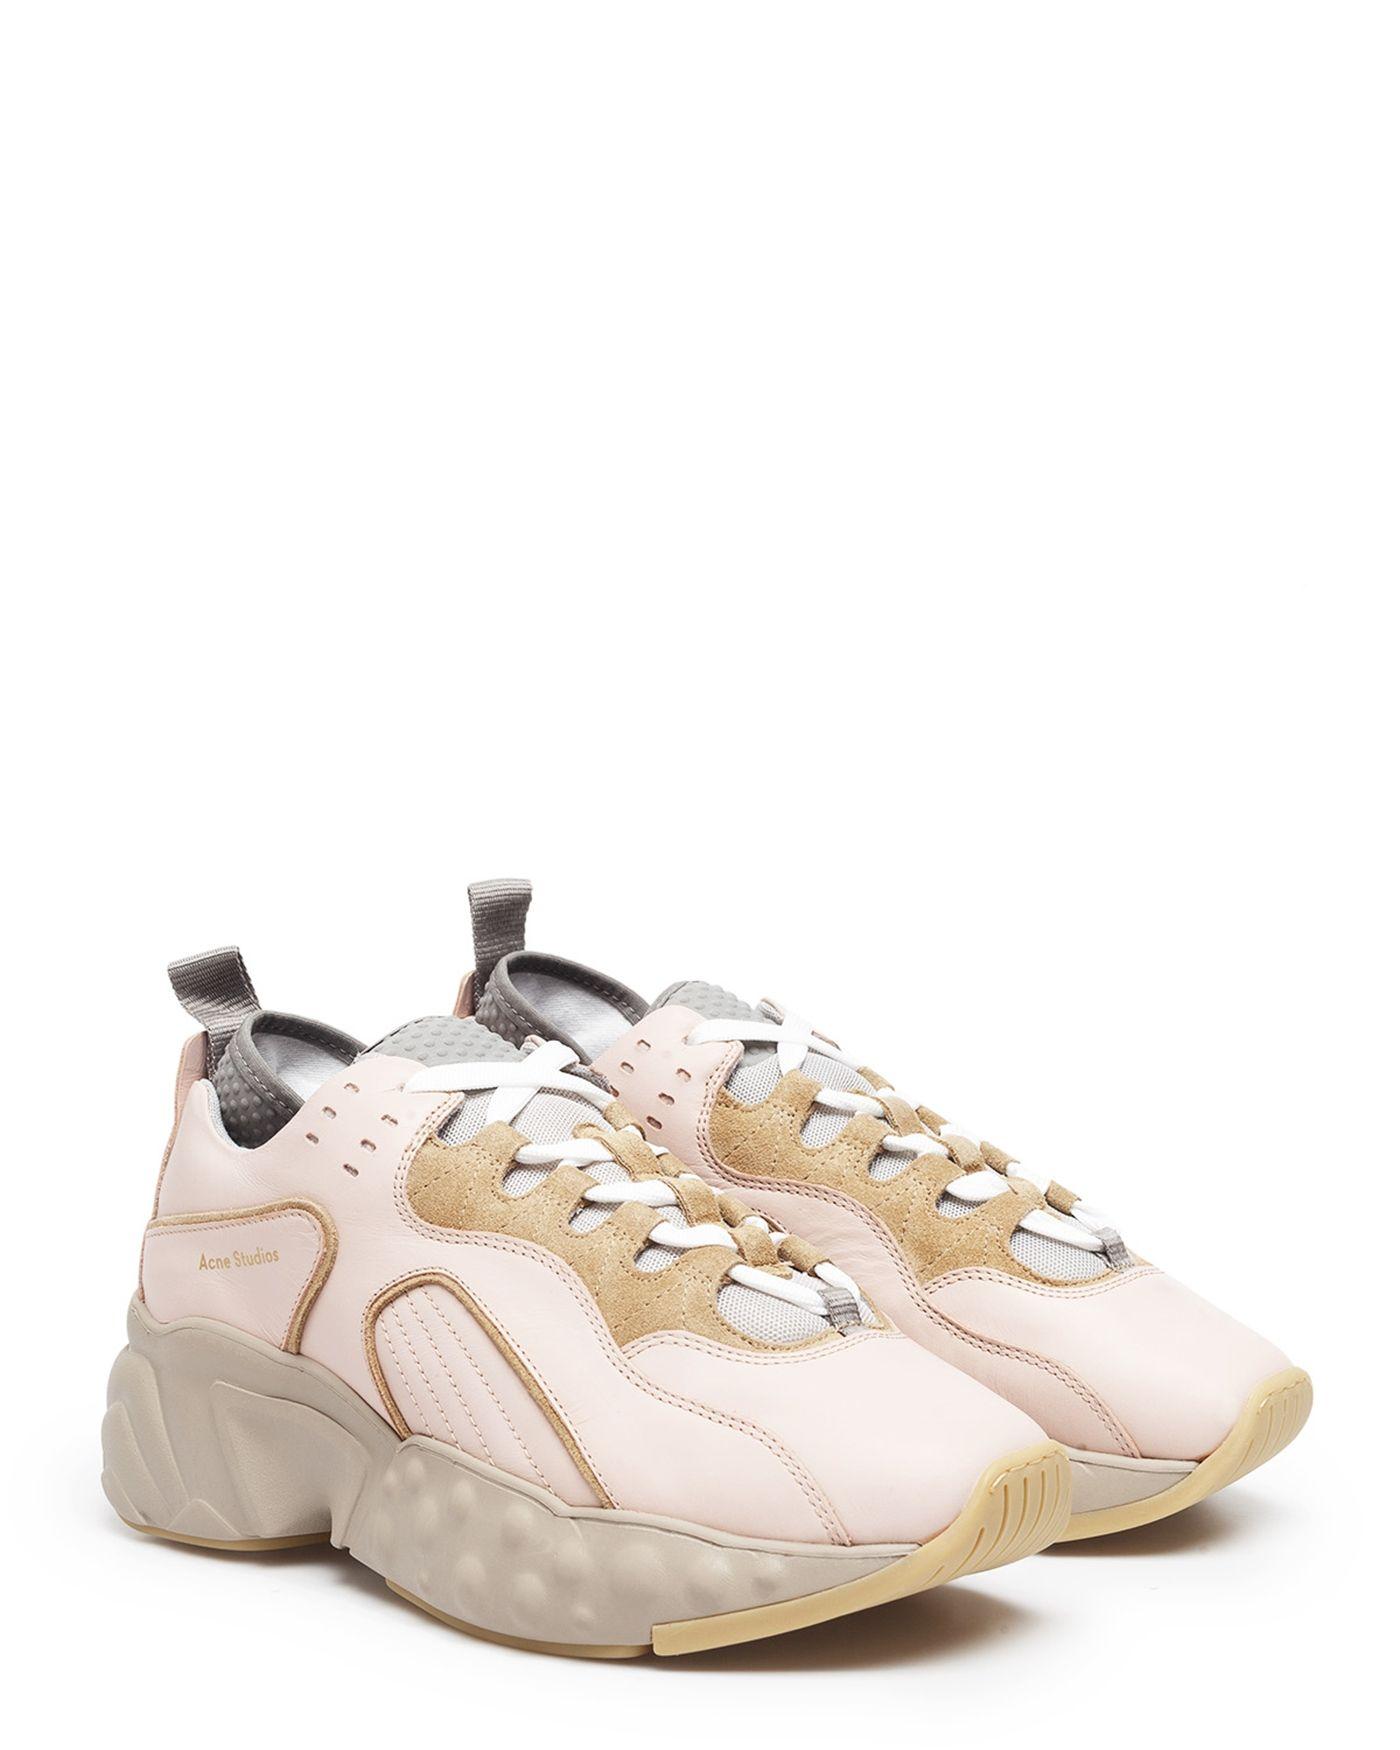 Acne Studios Manhattan Nappa PinkBeige Sneakers